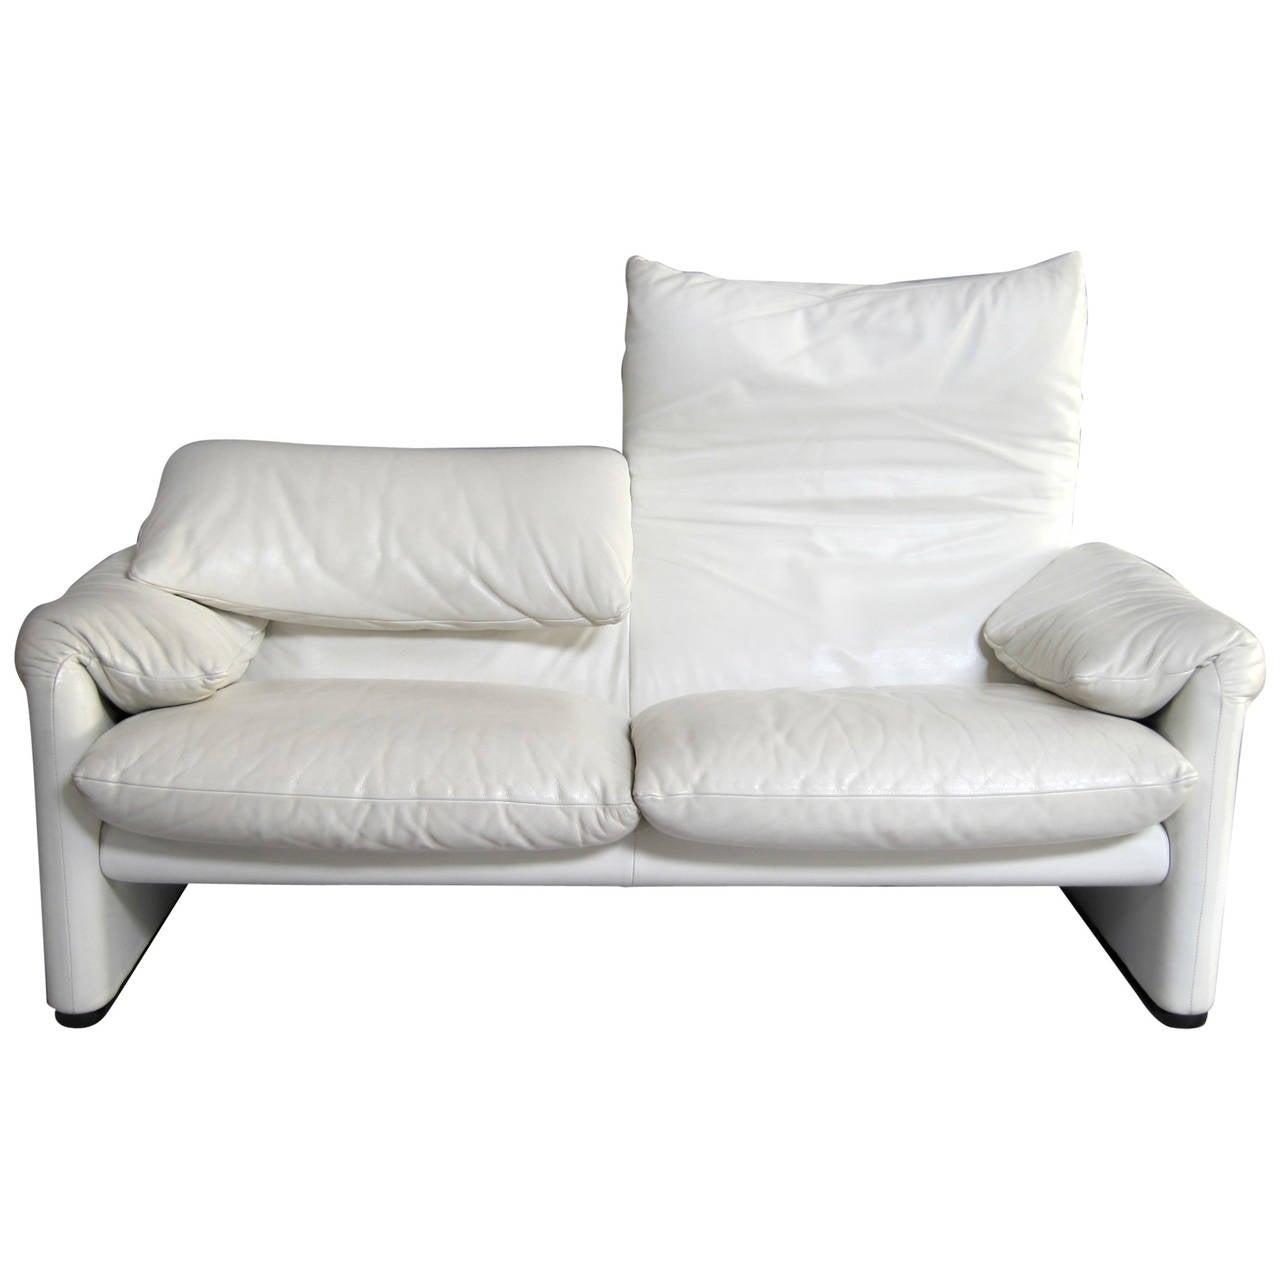 Timeless sofa maralunga by vico magistretti italy for Sofa timeless